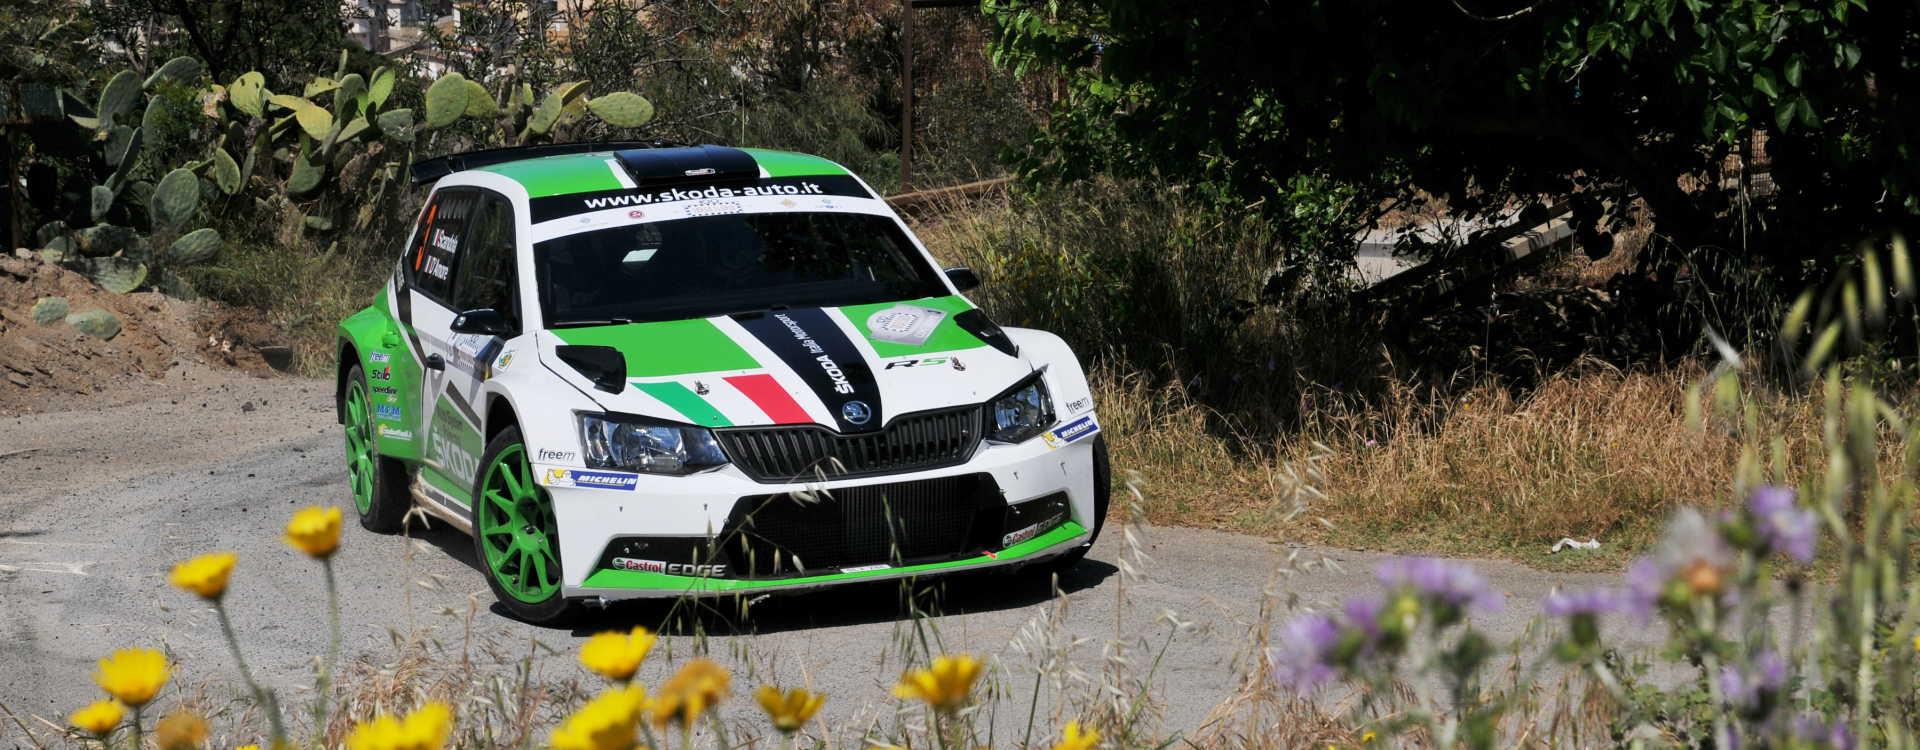 PHOTO: Podium result for ŠKODA Italia Motorsport at the Targa Florio